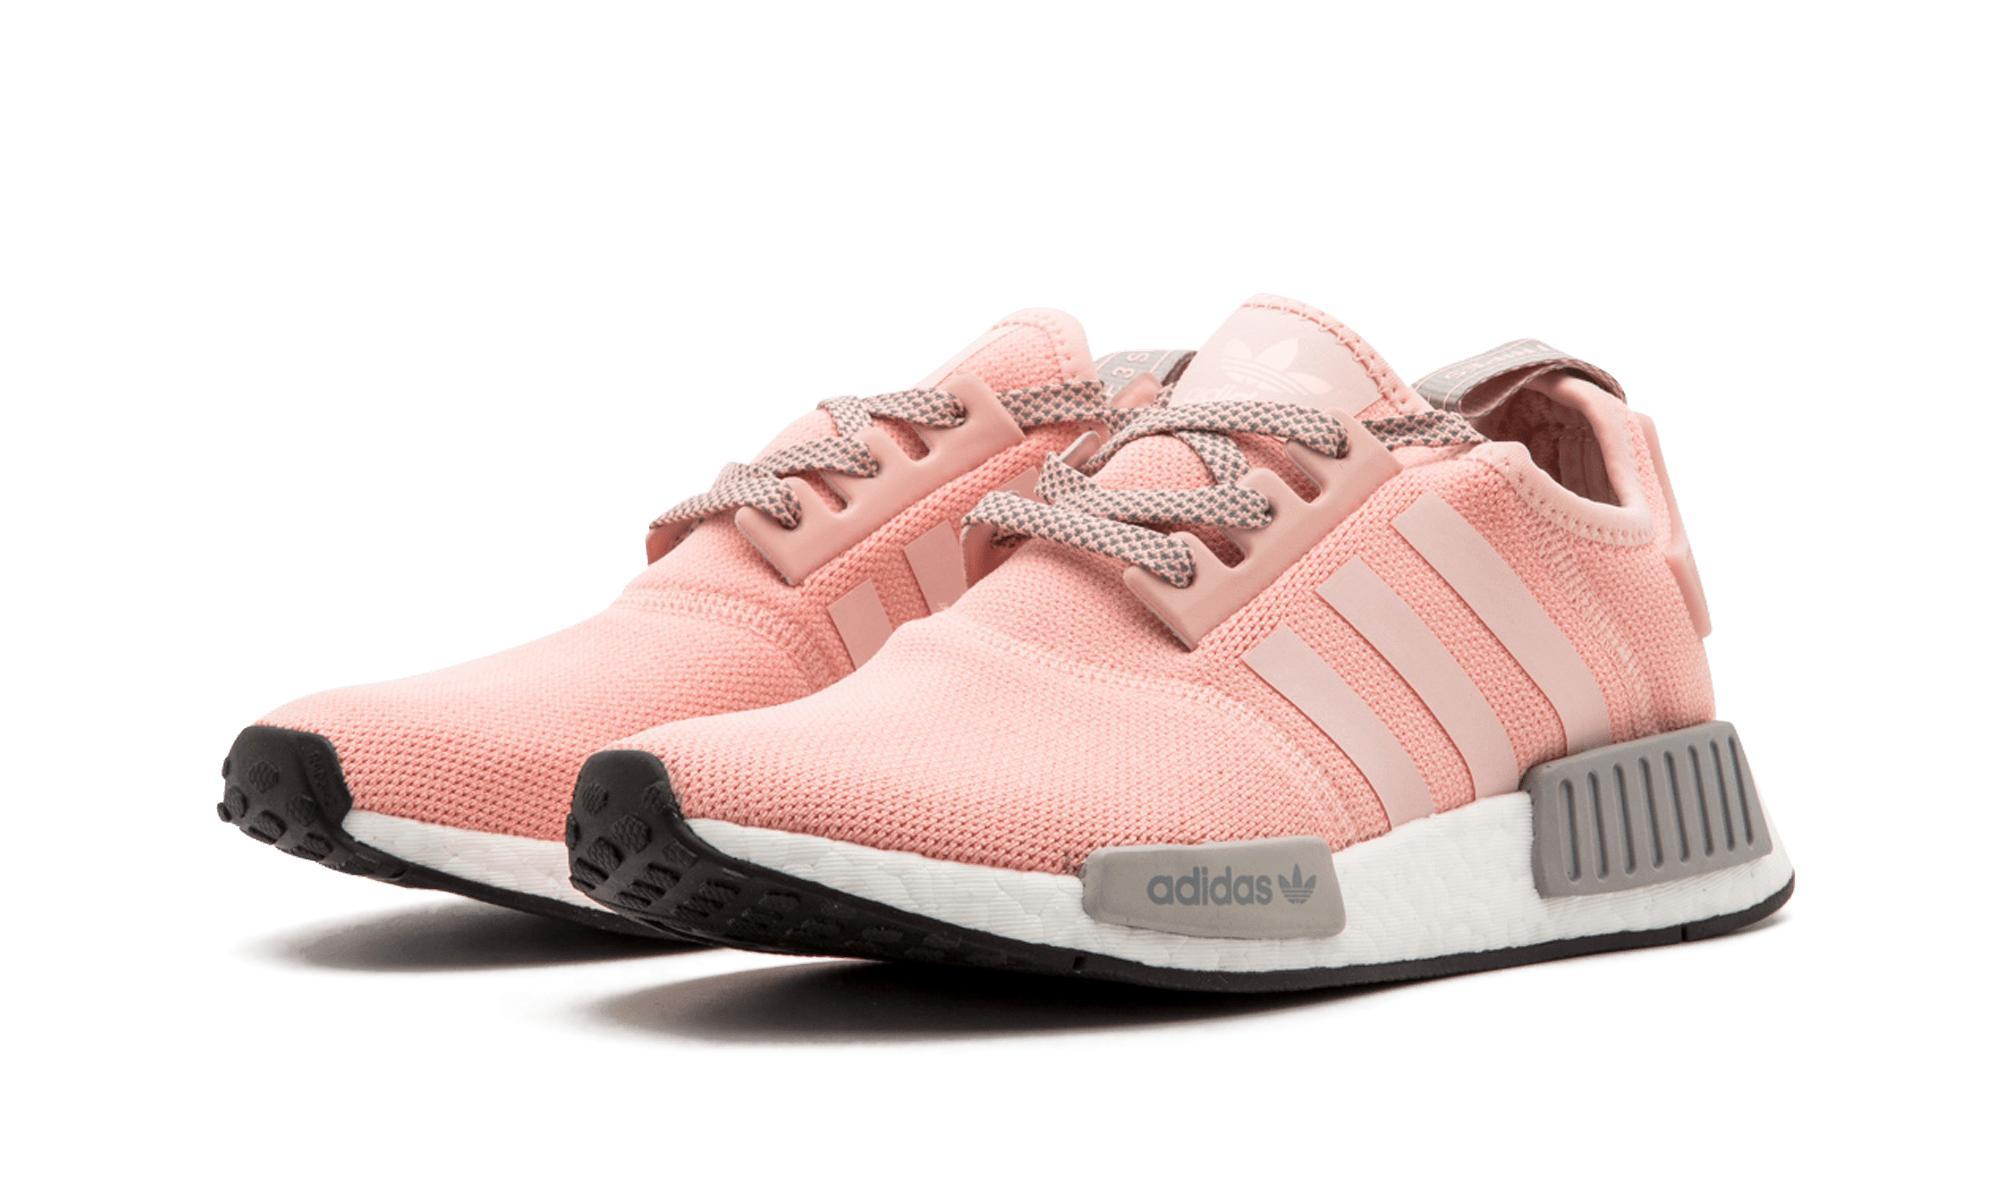 6d17c15c58210 Teal Pink Adidas Nmd Hear Grey Raw Pink Durable Adidas Nmd Hear Grey ...